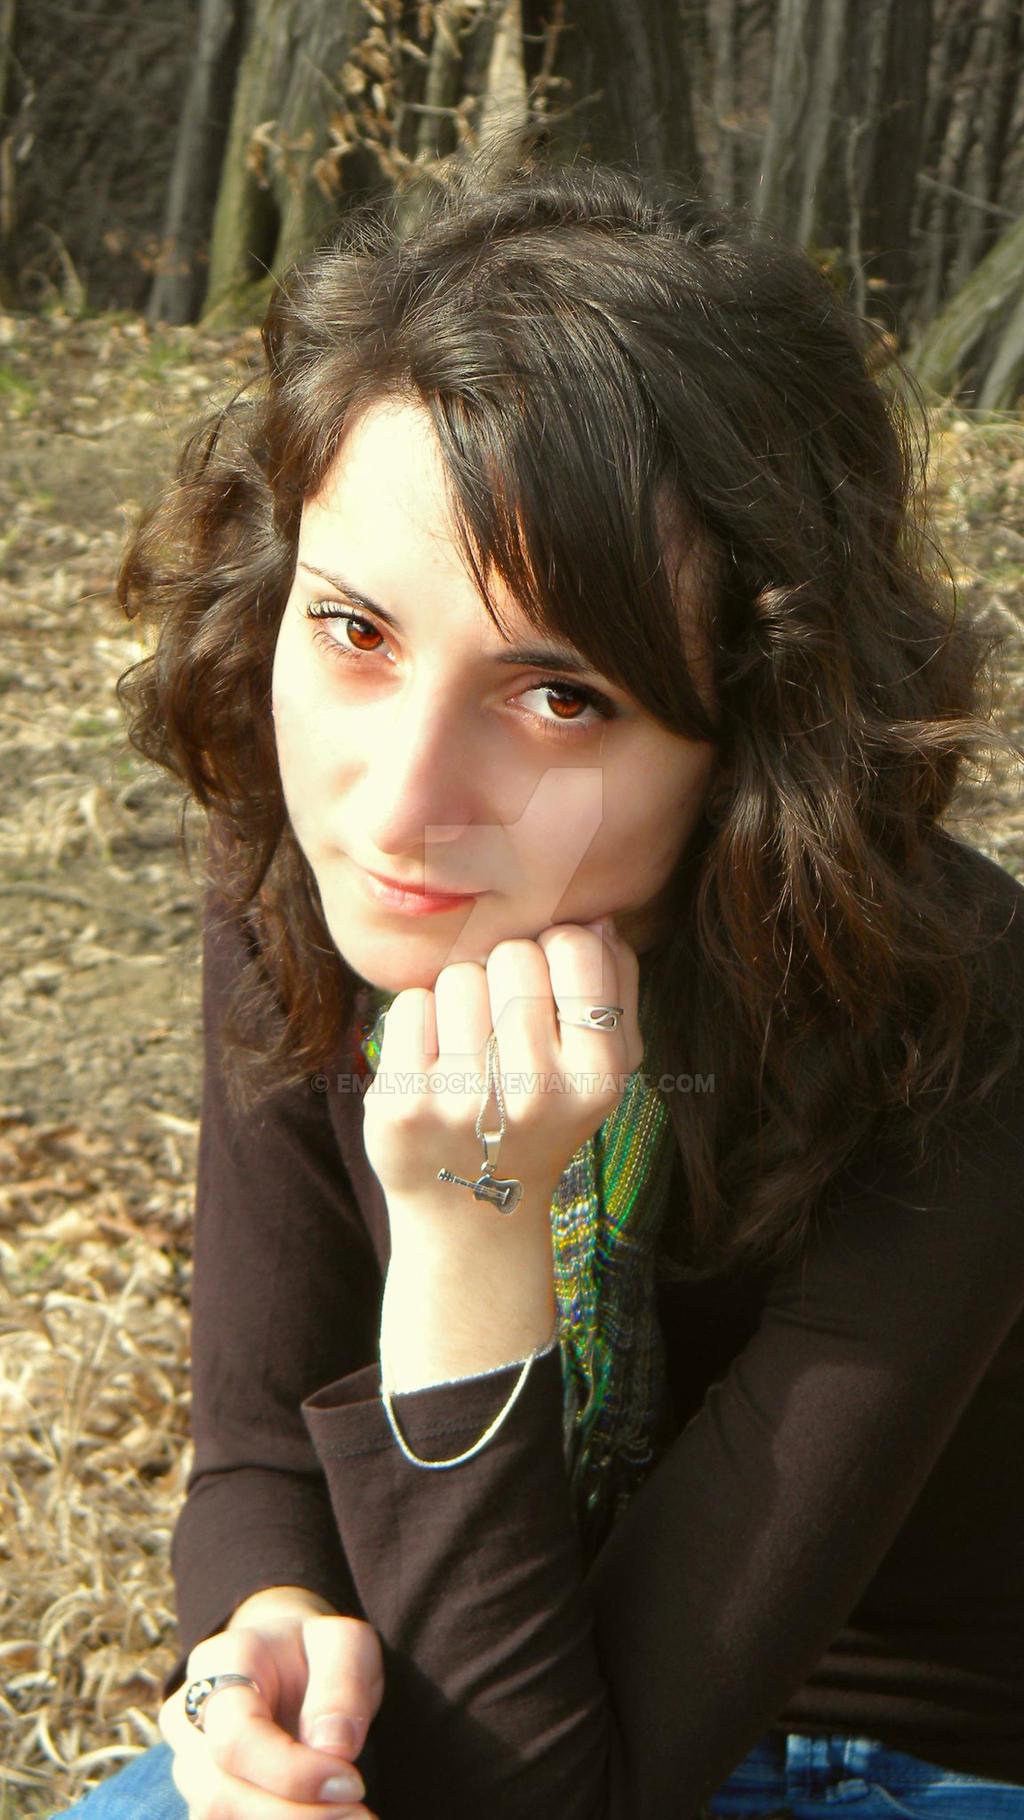 Emilyrock's Profile Picture